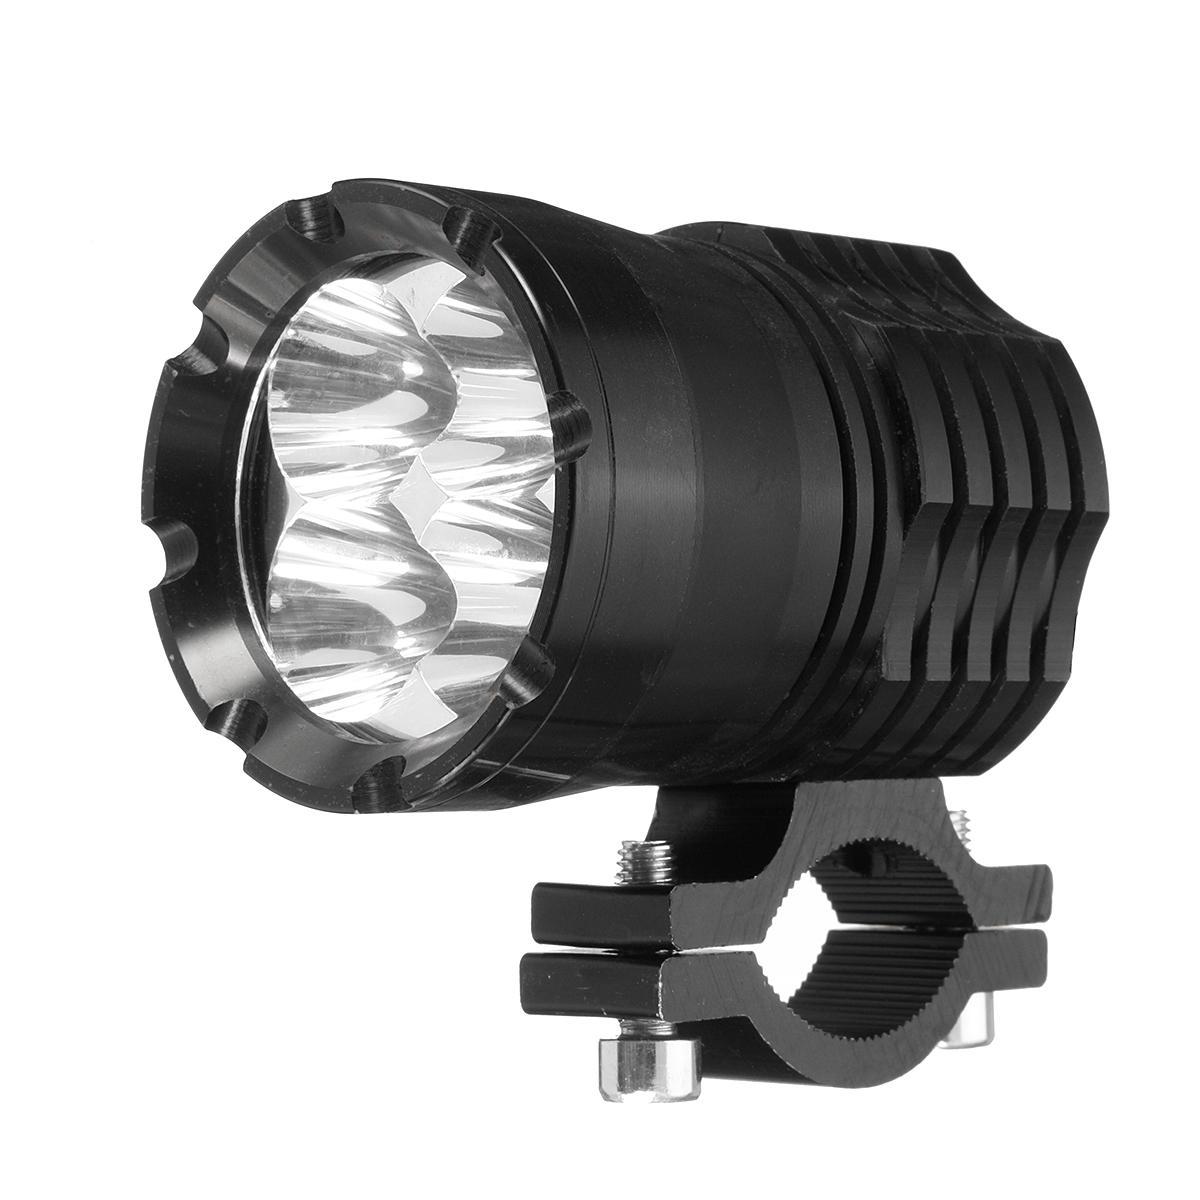 12V-80V U21 40W אופנוע LED ספוט אור פנס ערפל נהיגה מנורה לבן